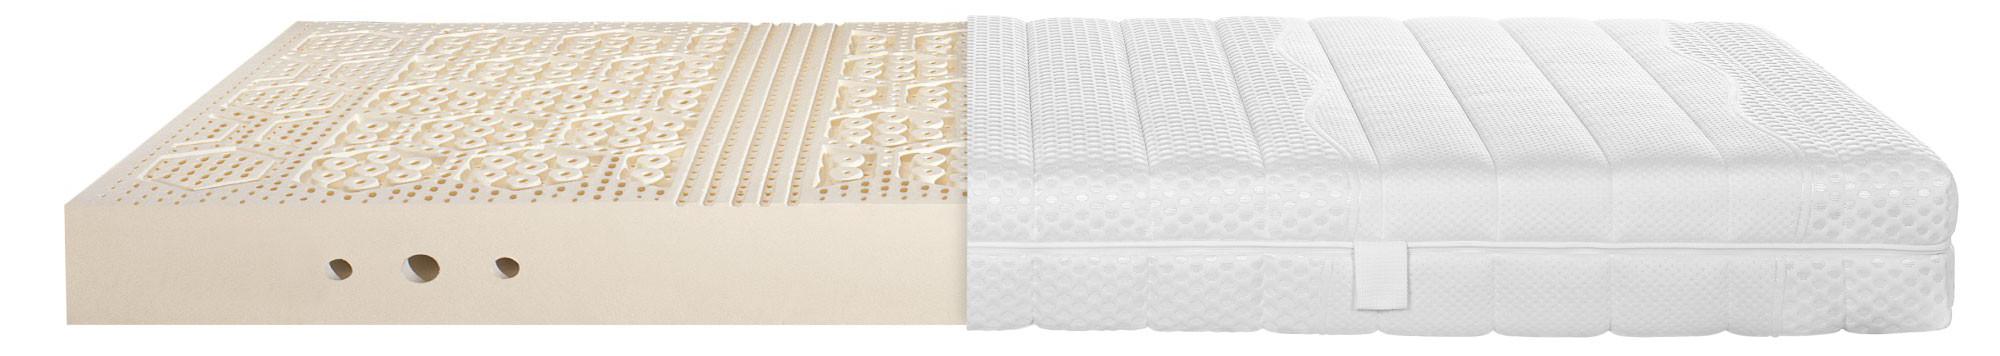 visco matratzen stiftung warentest simple matratze so bewertete die stiftung warentest with. Black Bedroom Furniture Sets. Home Design Ideas